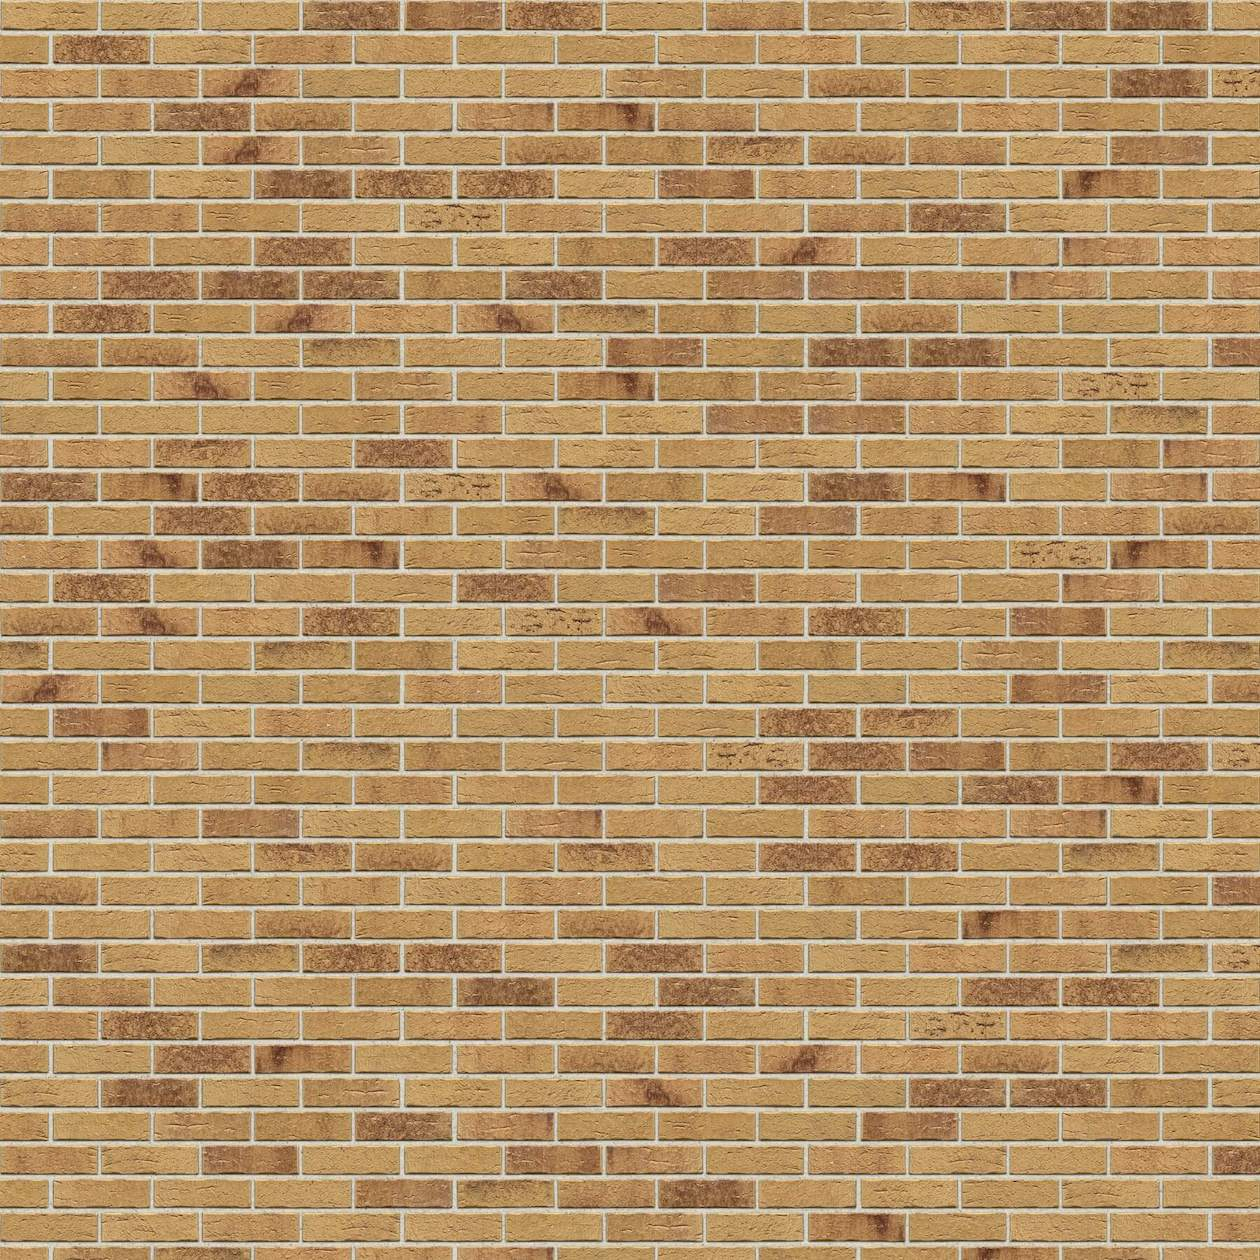 Puna-cigla-FeldHaus-Klinker-brick-house-nf-k-688-Bela Fuga